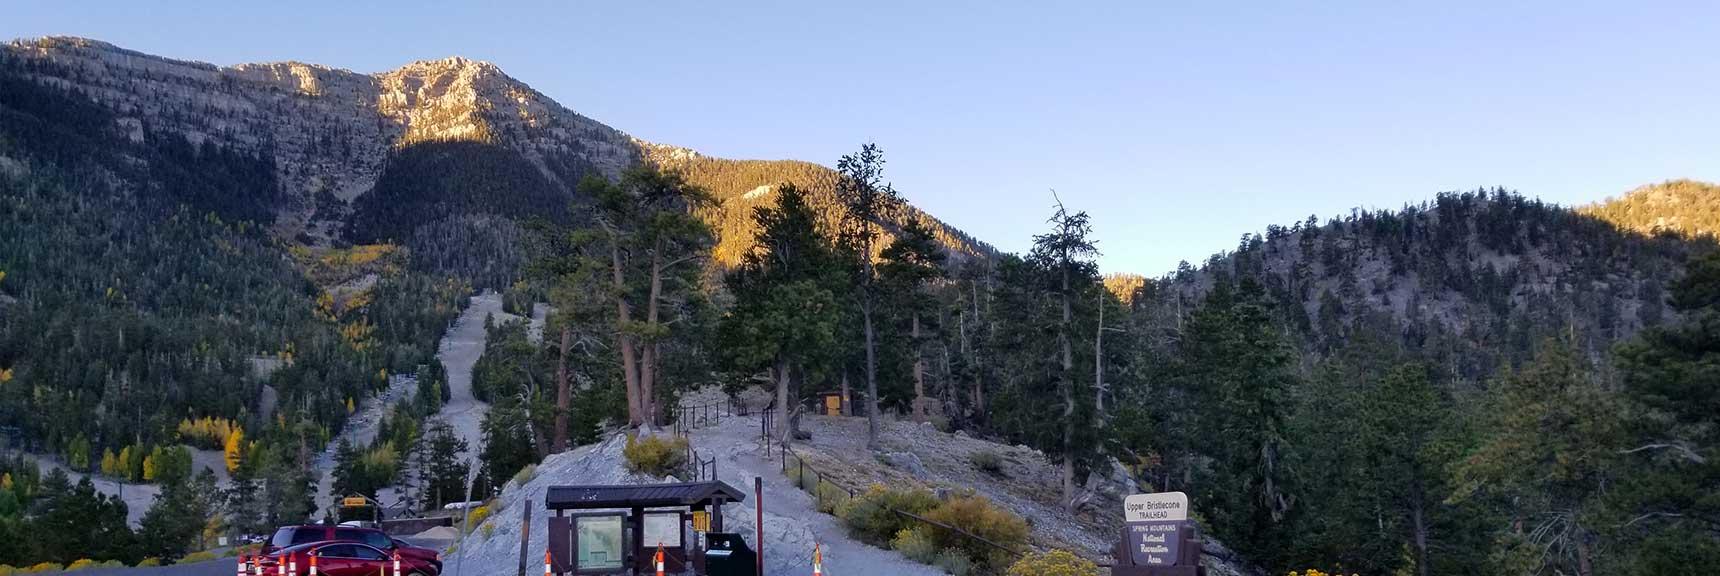 Bristlecone Pine Trail Trailhead in Lee Canyon, Mt. Charleston Wilderness, Nevada